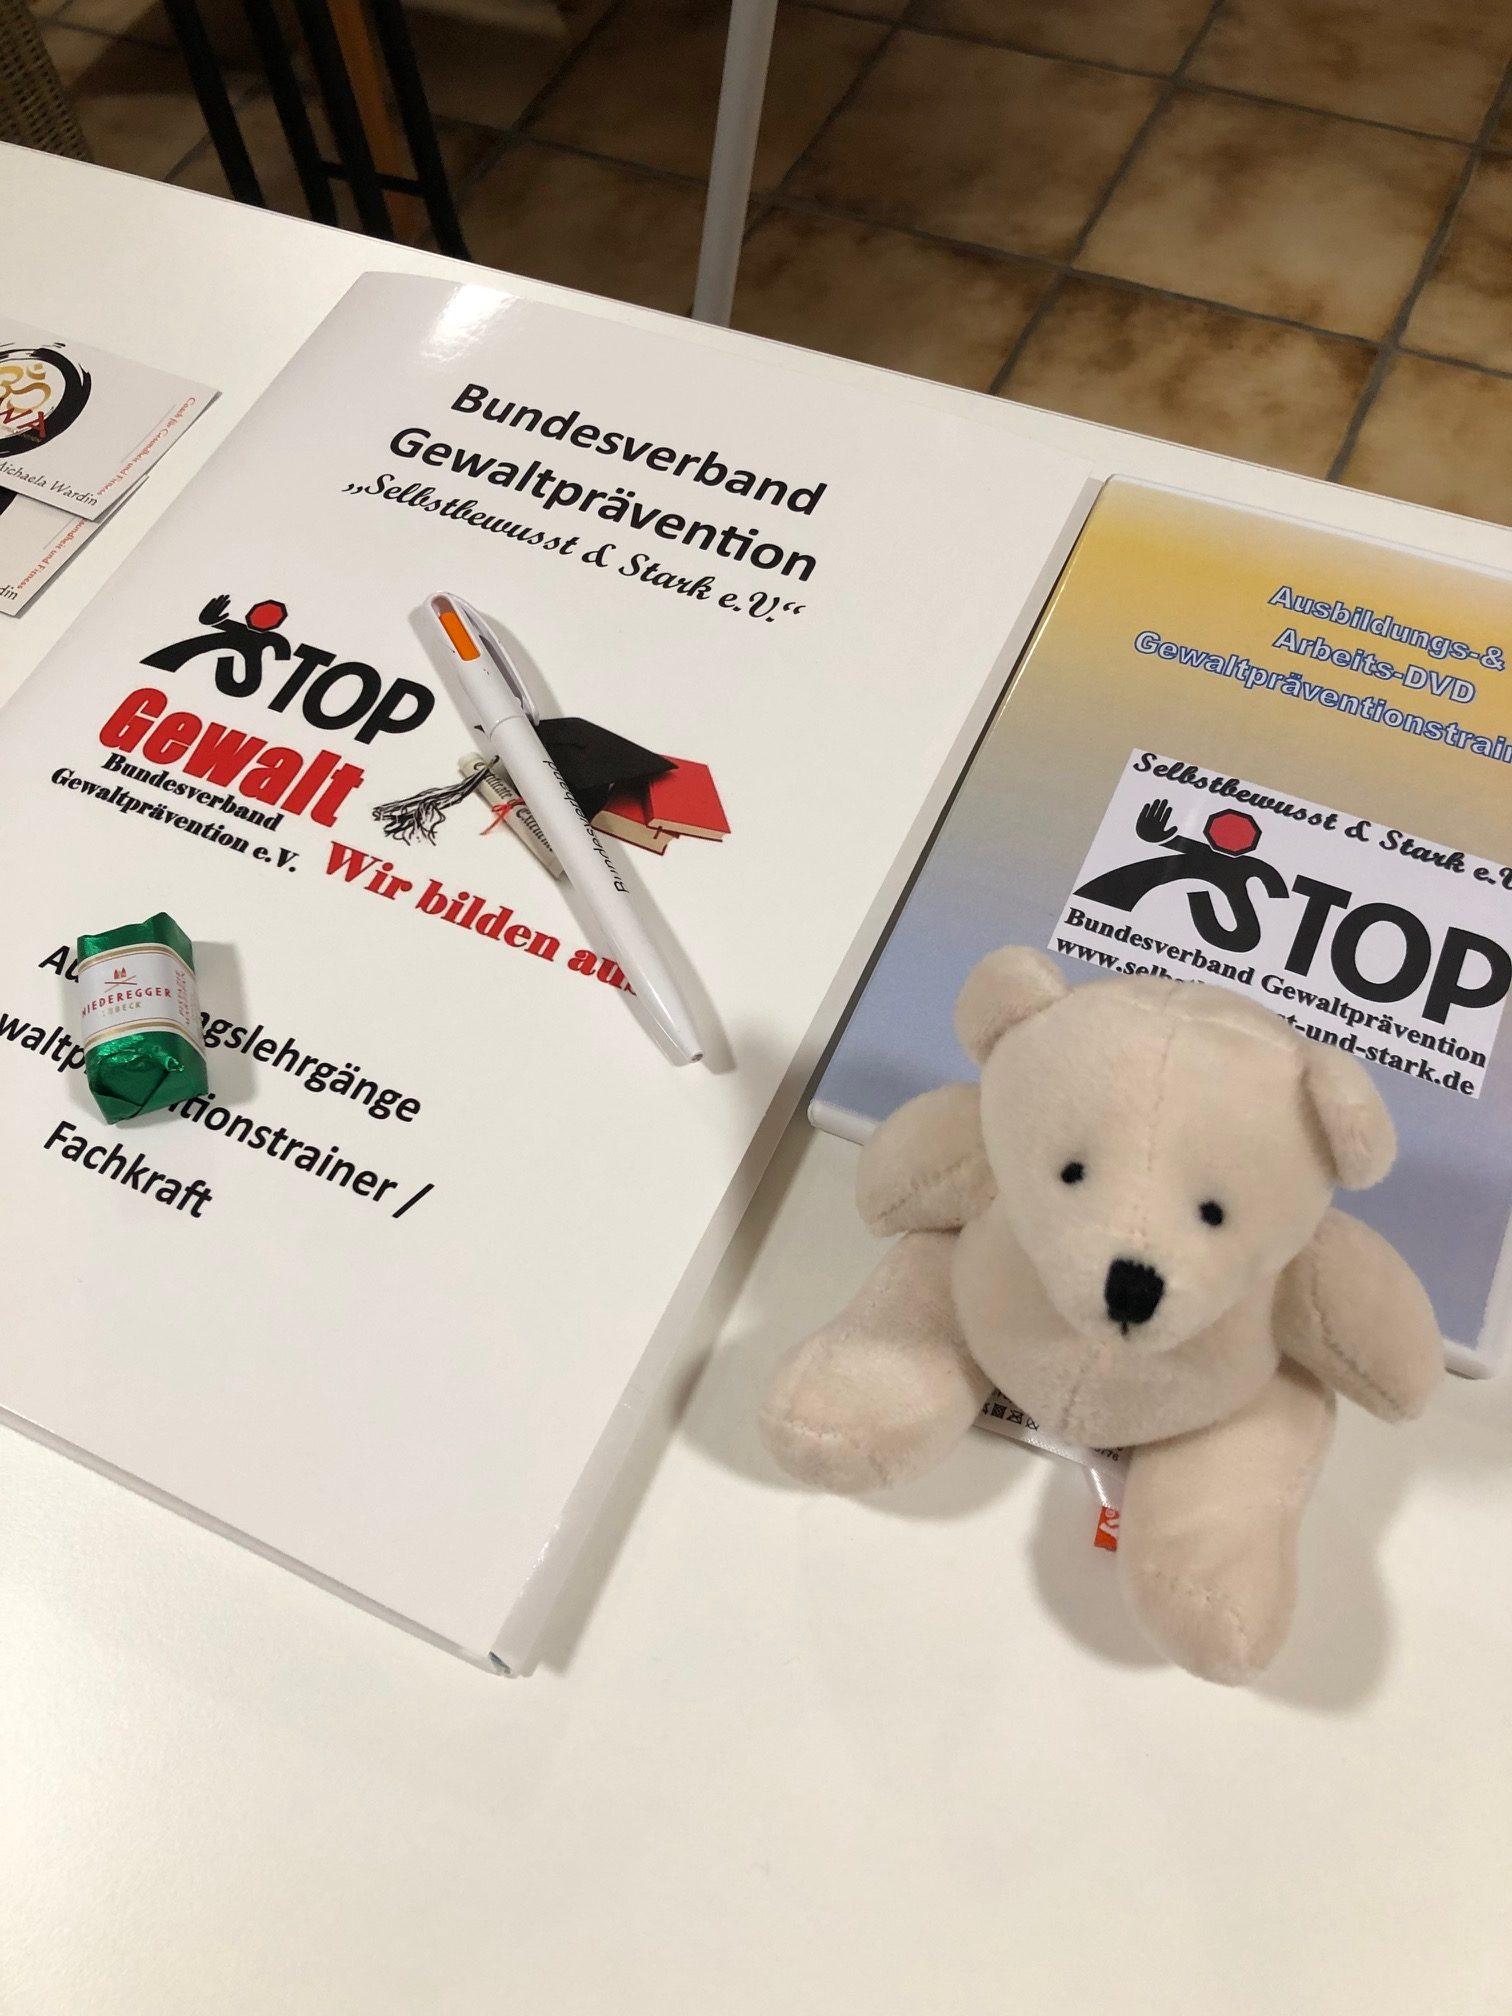 Gewaltpräventionsausbildung Stufe D